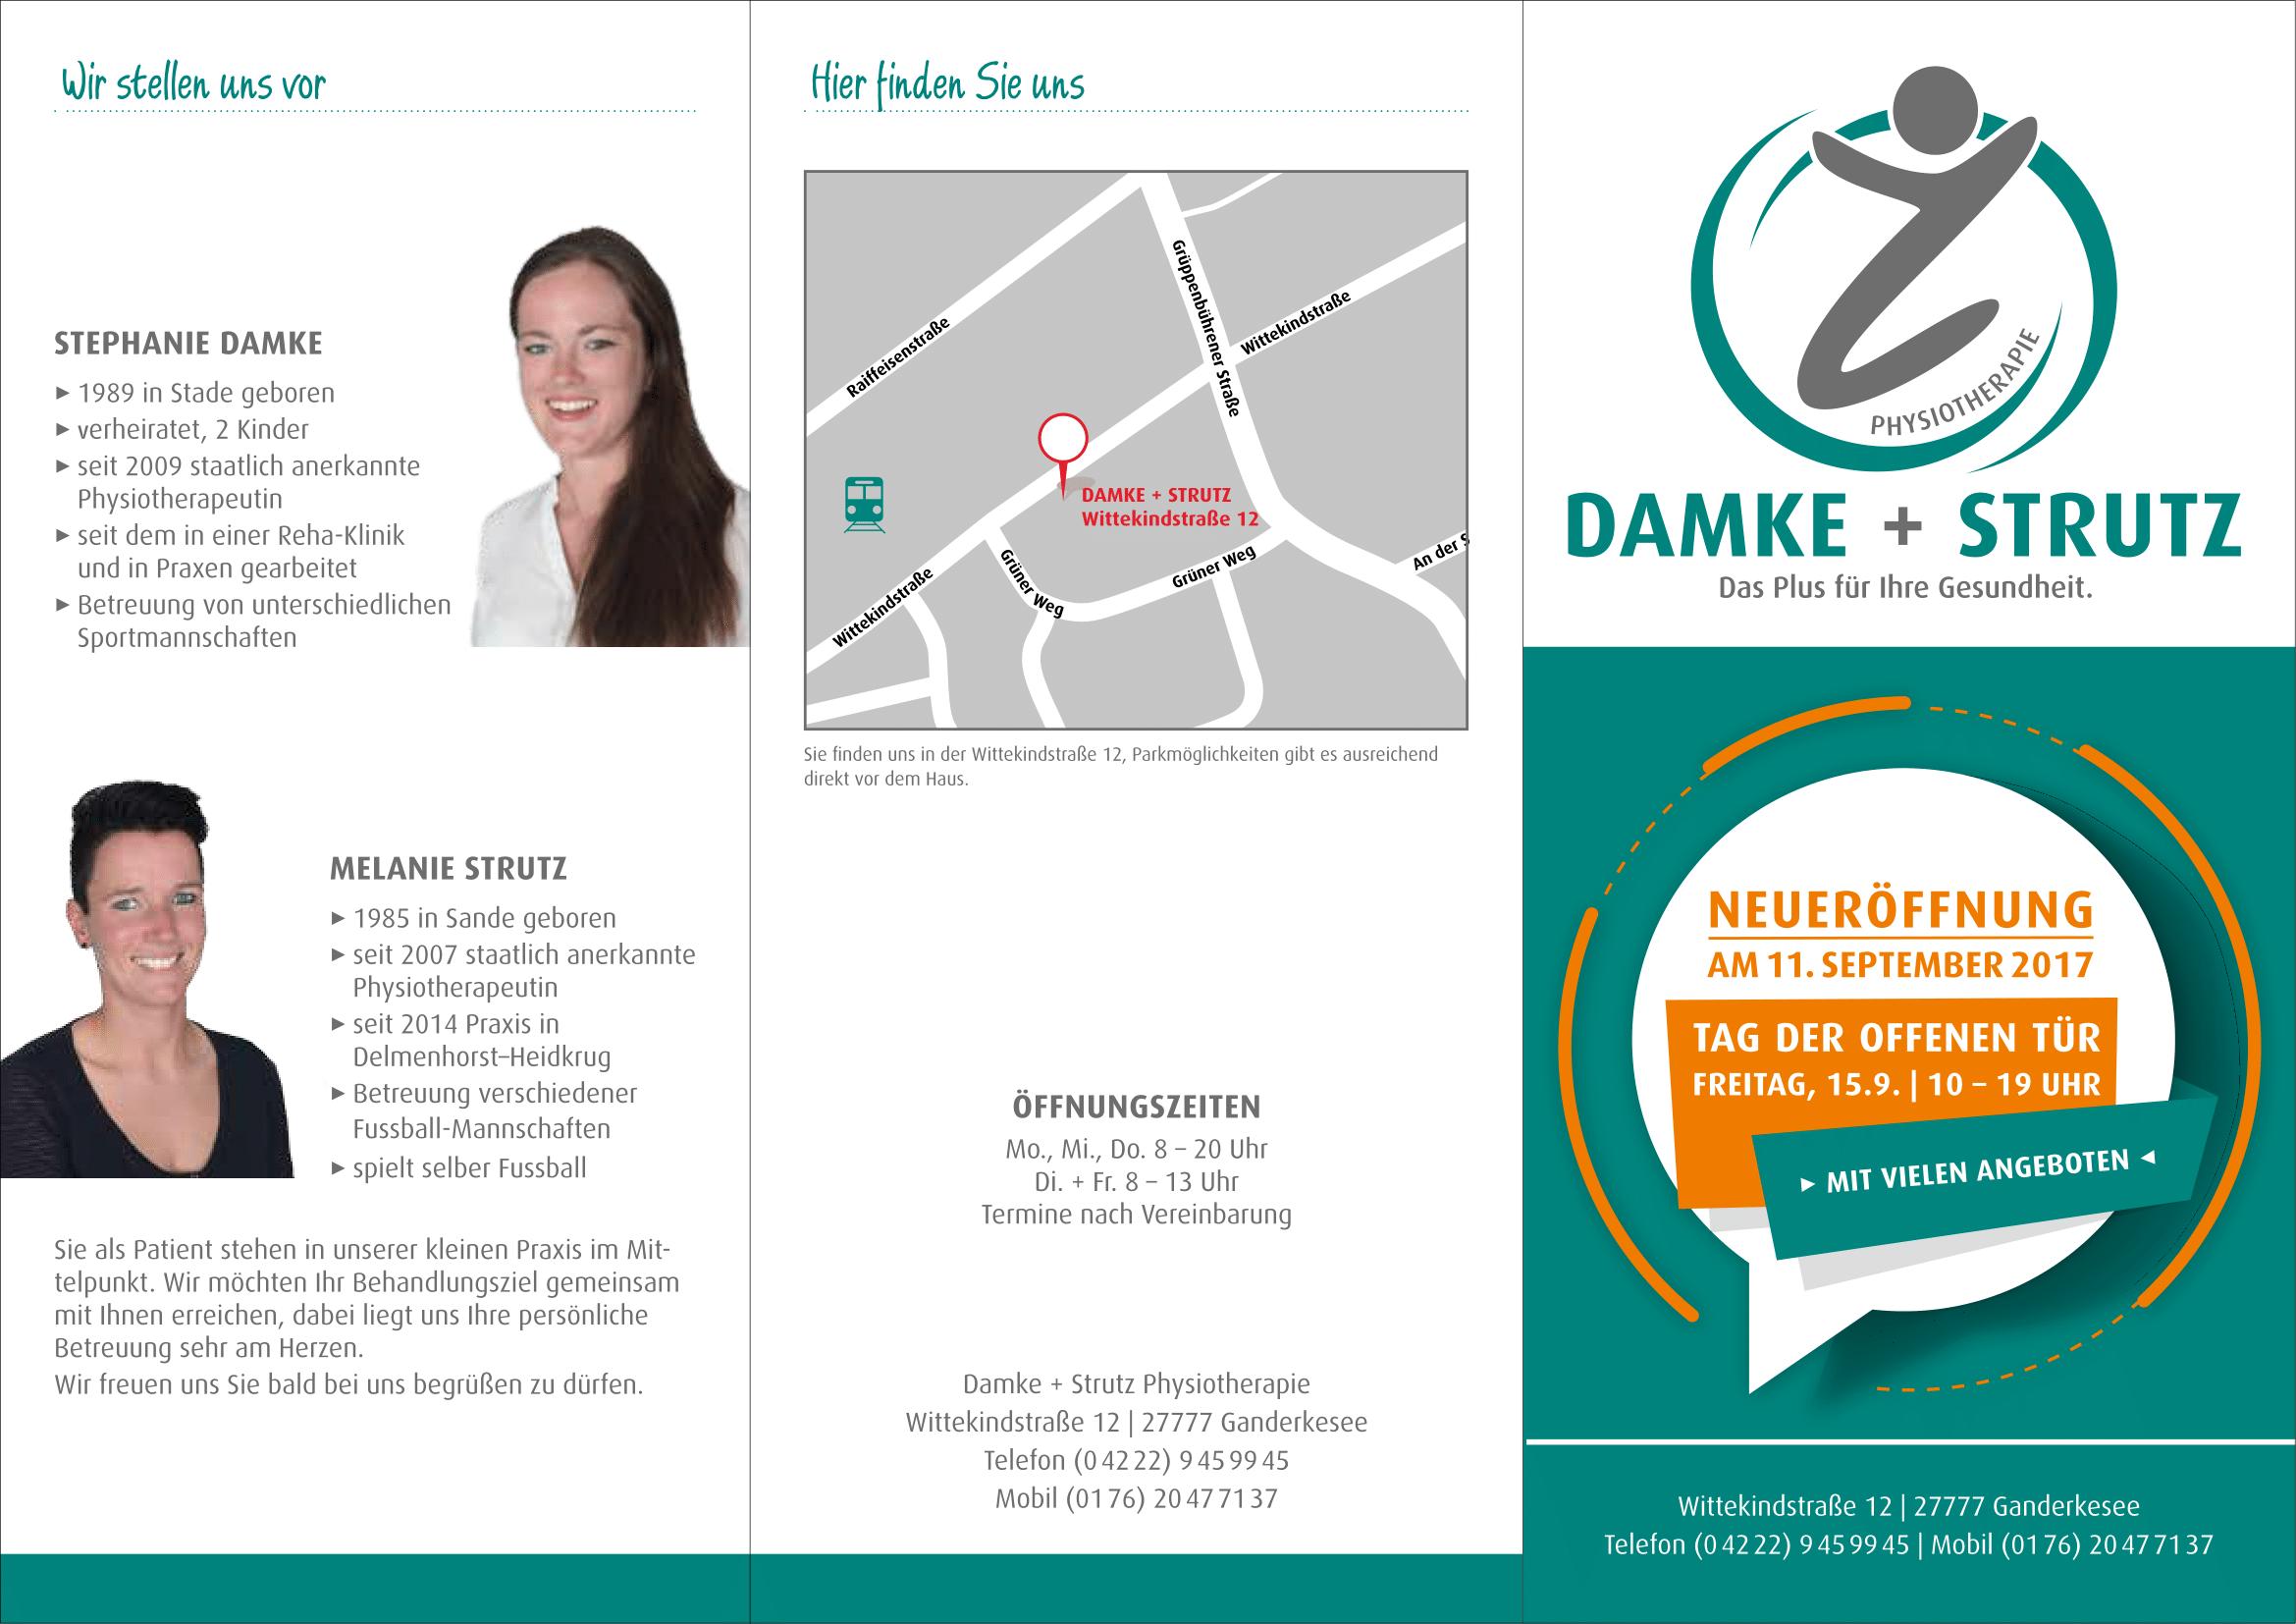 DAMKE + STRUTZ Physiotherapie / Krankengymnastik - 3 Fotos ...